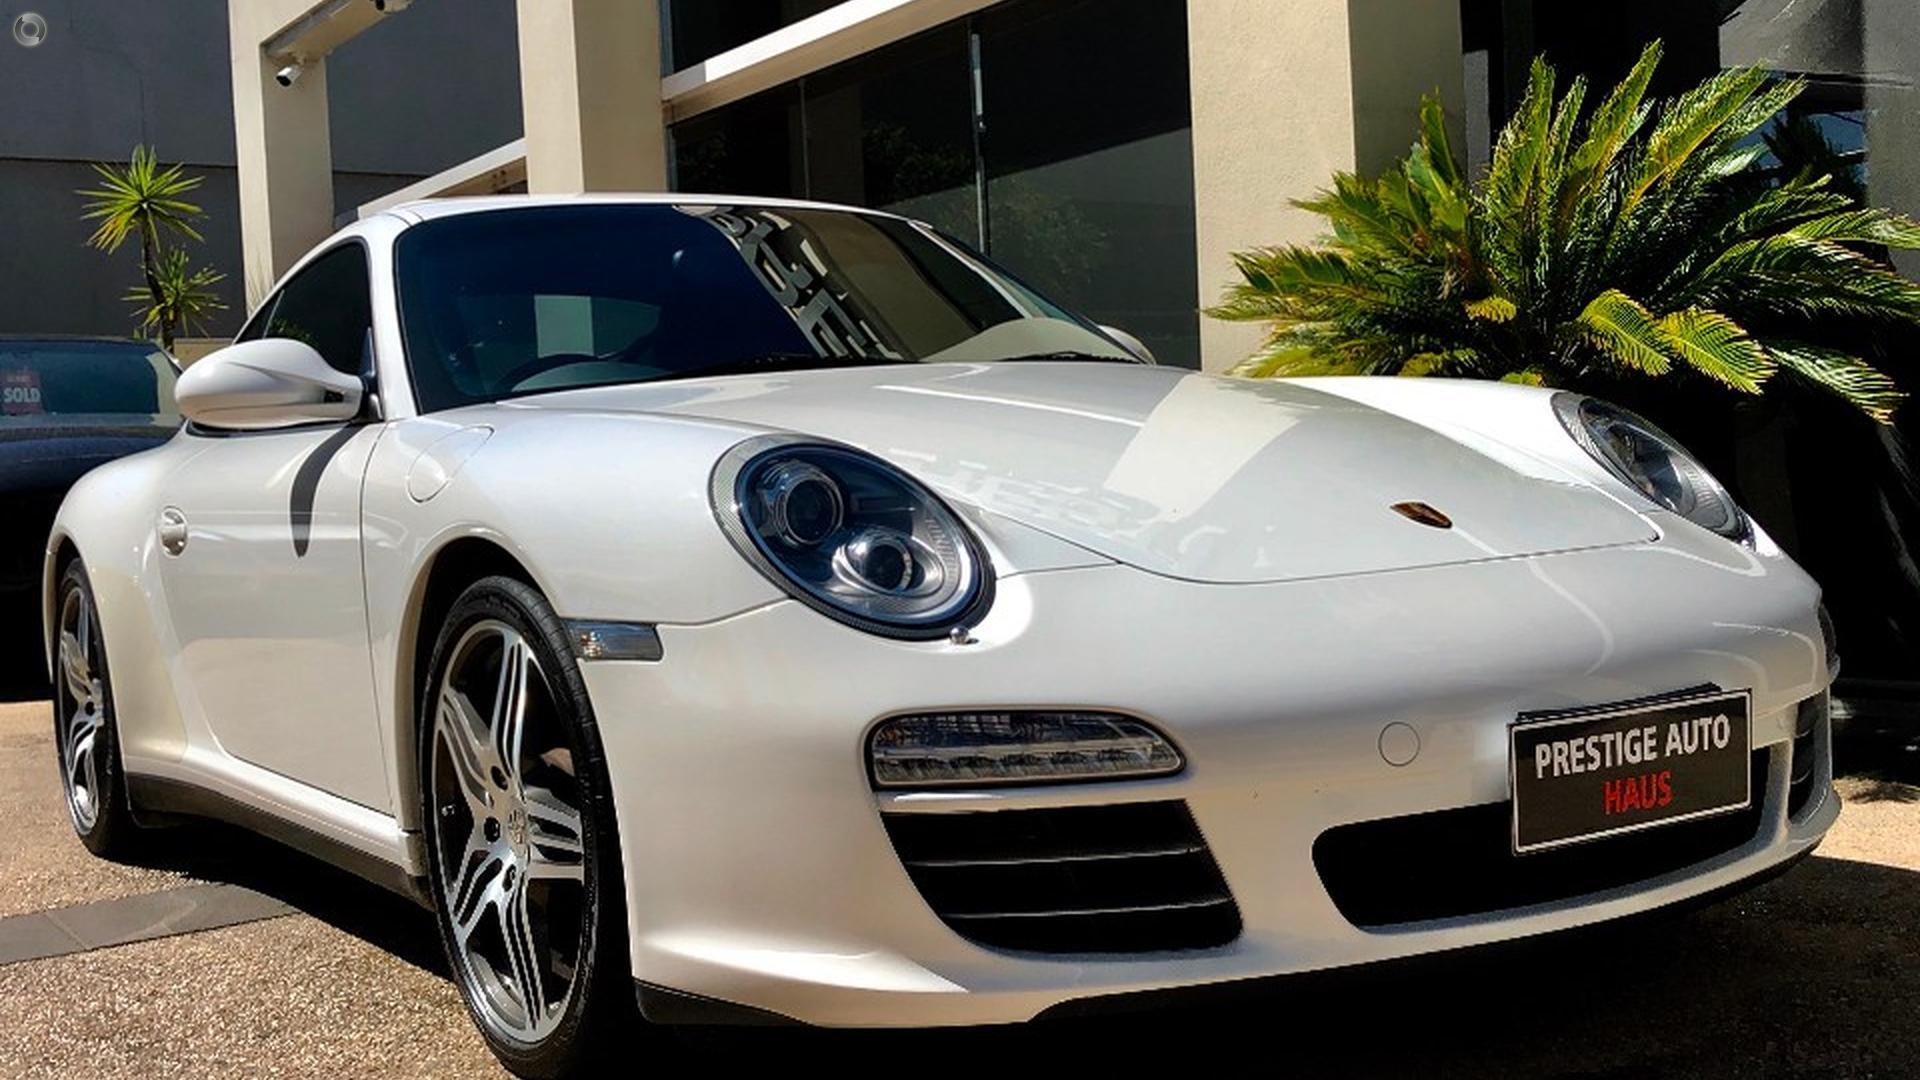 2008 Porsche 911 Carrera 4S 997 Series II